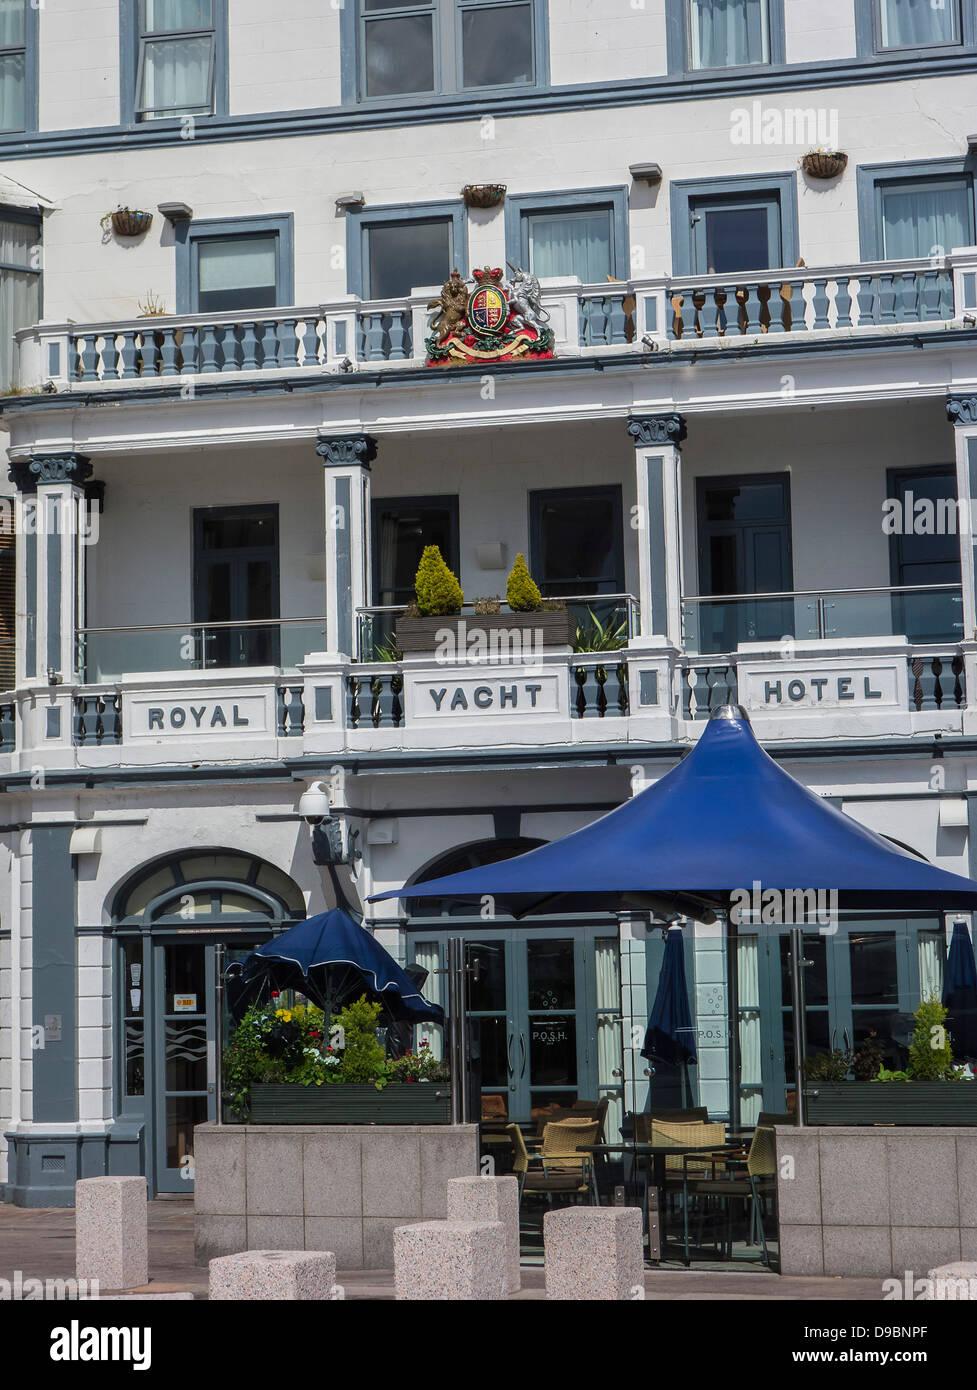 Jersey, Royal Yacht Hotel, St. Helier, Channel Islands - Stock Image